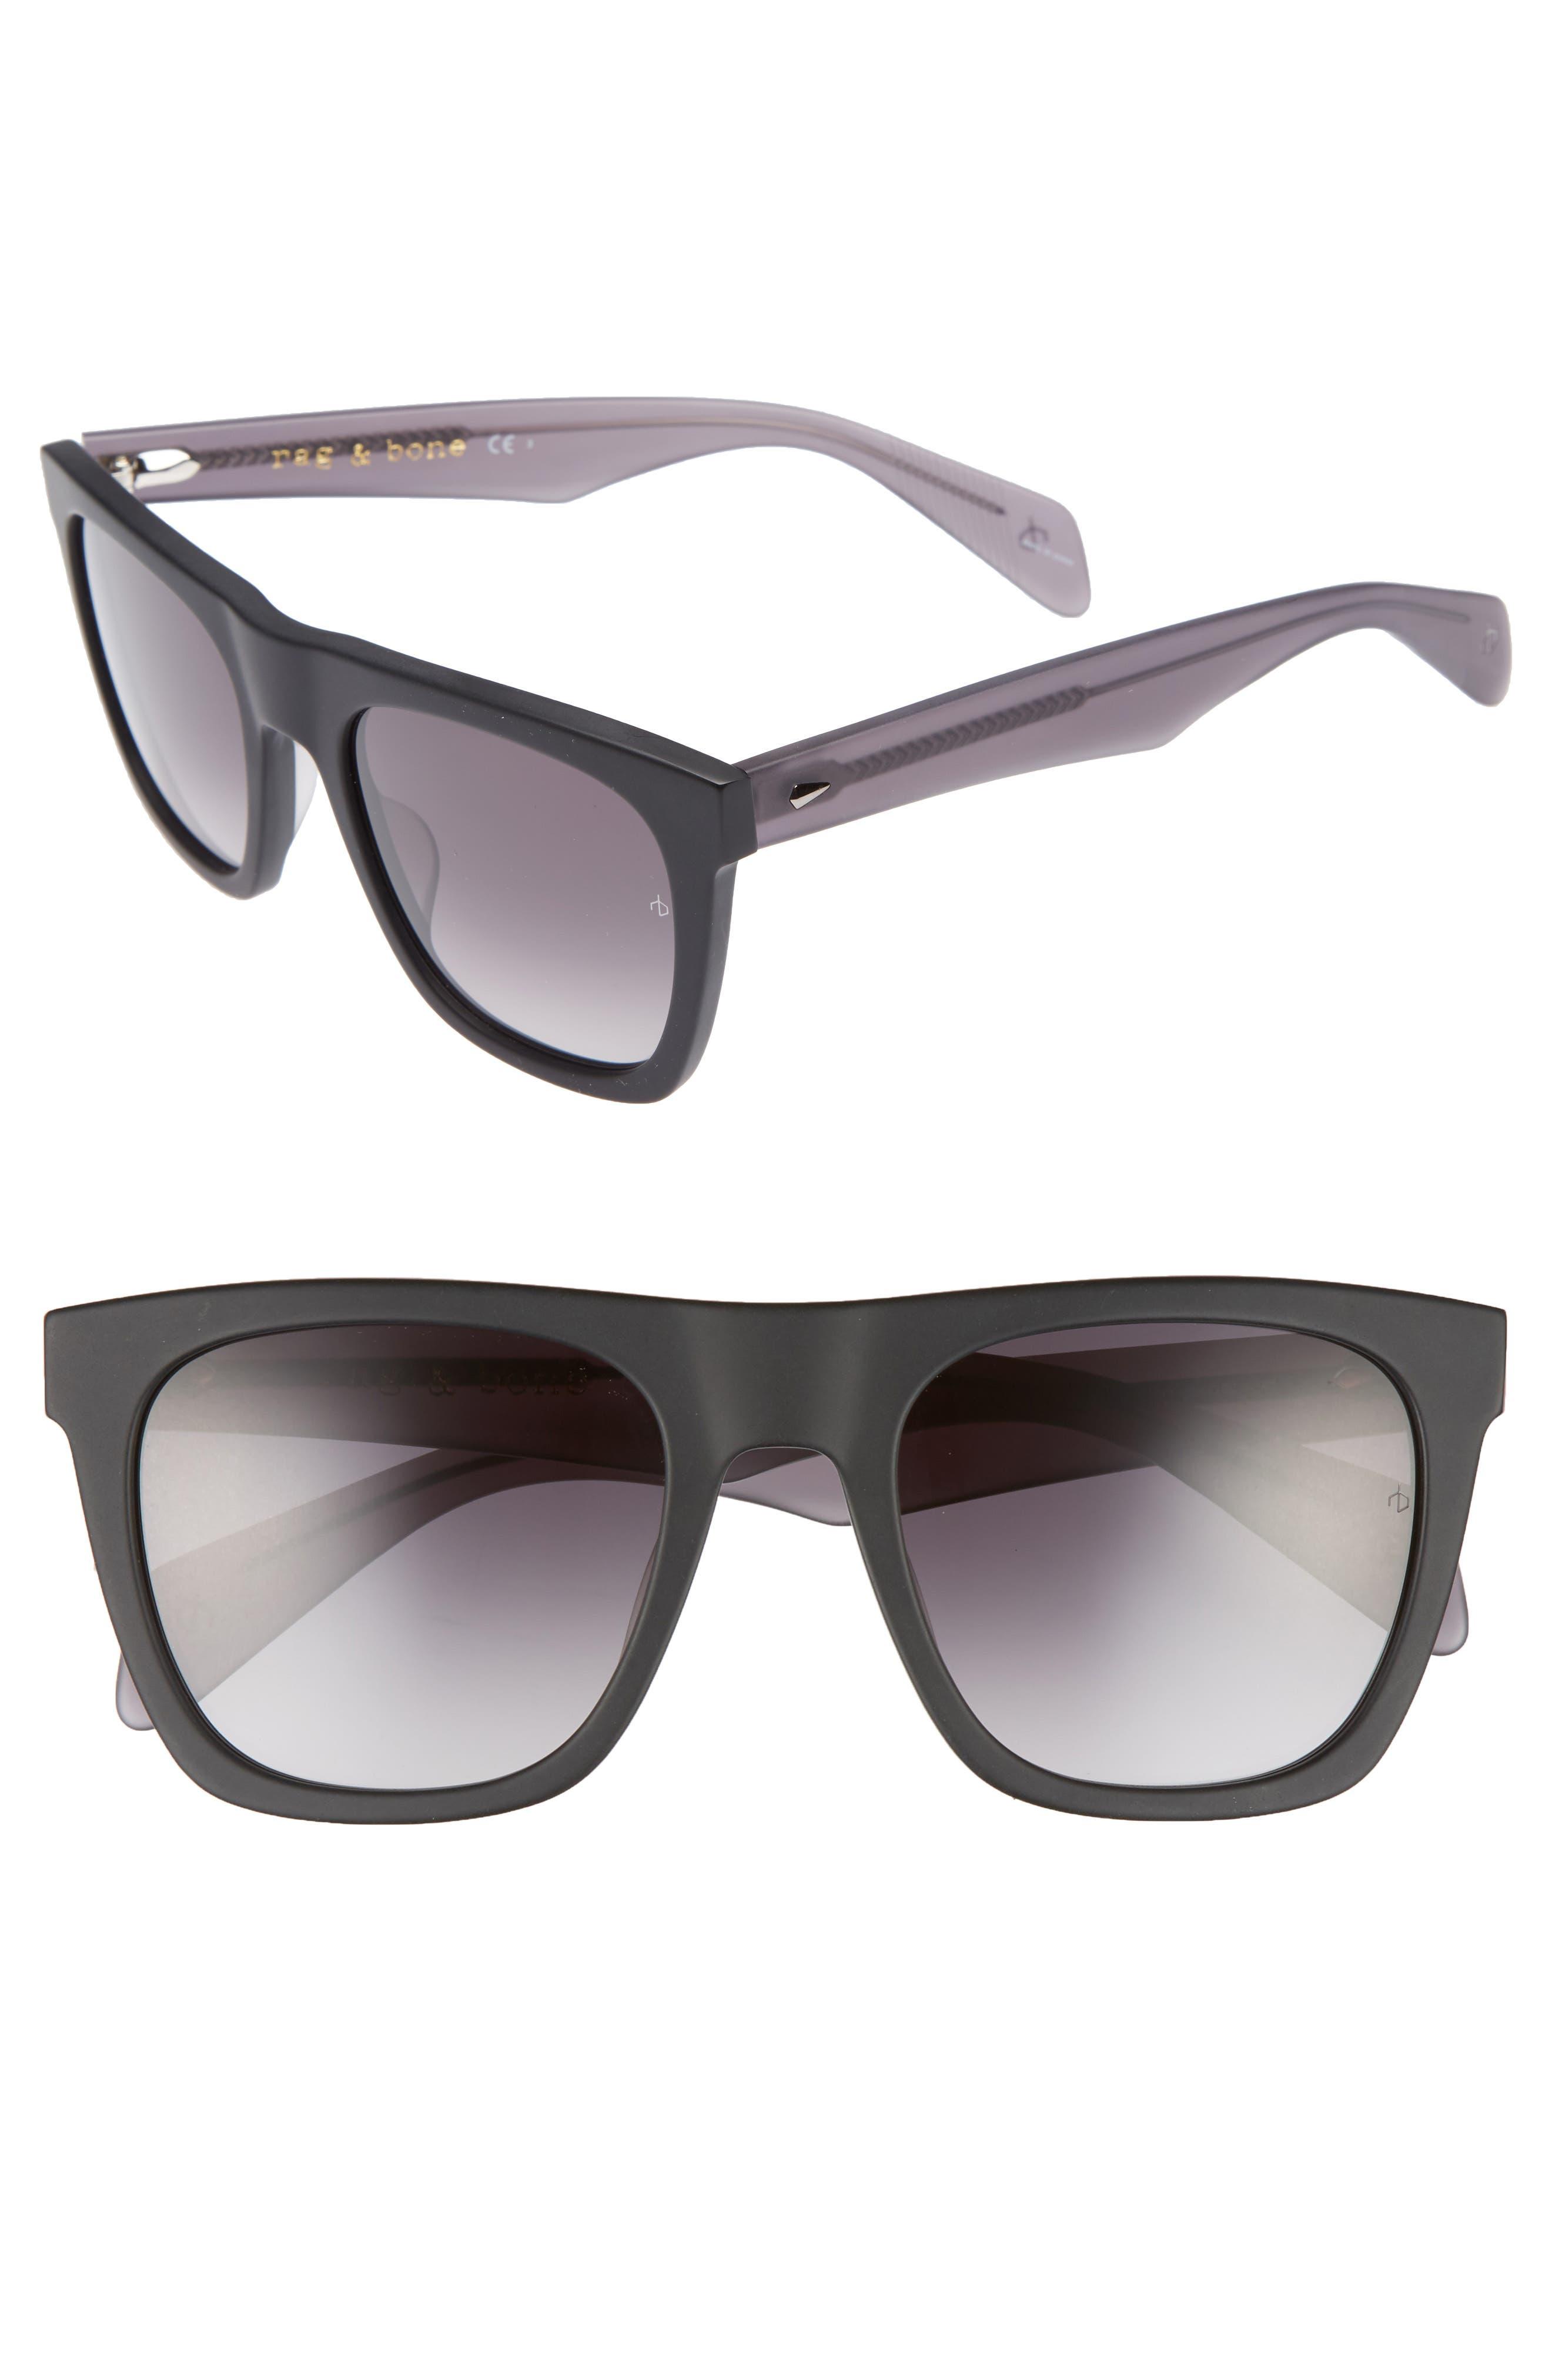 54mm Gradient Sunglasses,                             Main thumbnail 1, color,                             Blue/ Dark Grey